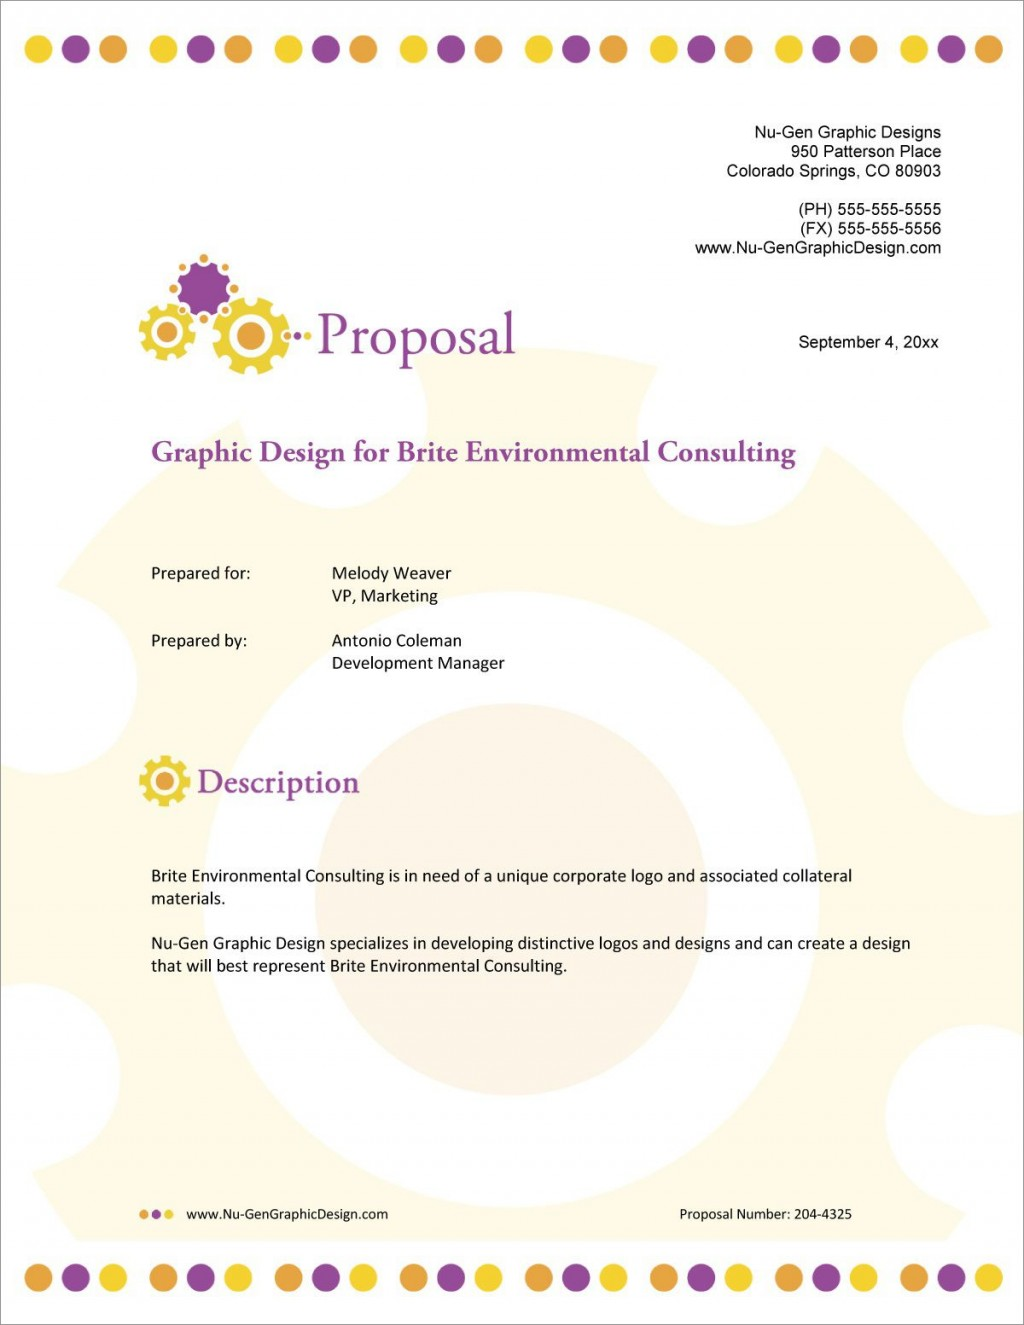 001 Incredible Graphic Design Proposal Sample Image  Pdf Free Template IndesignLarge